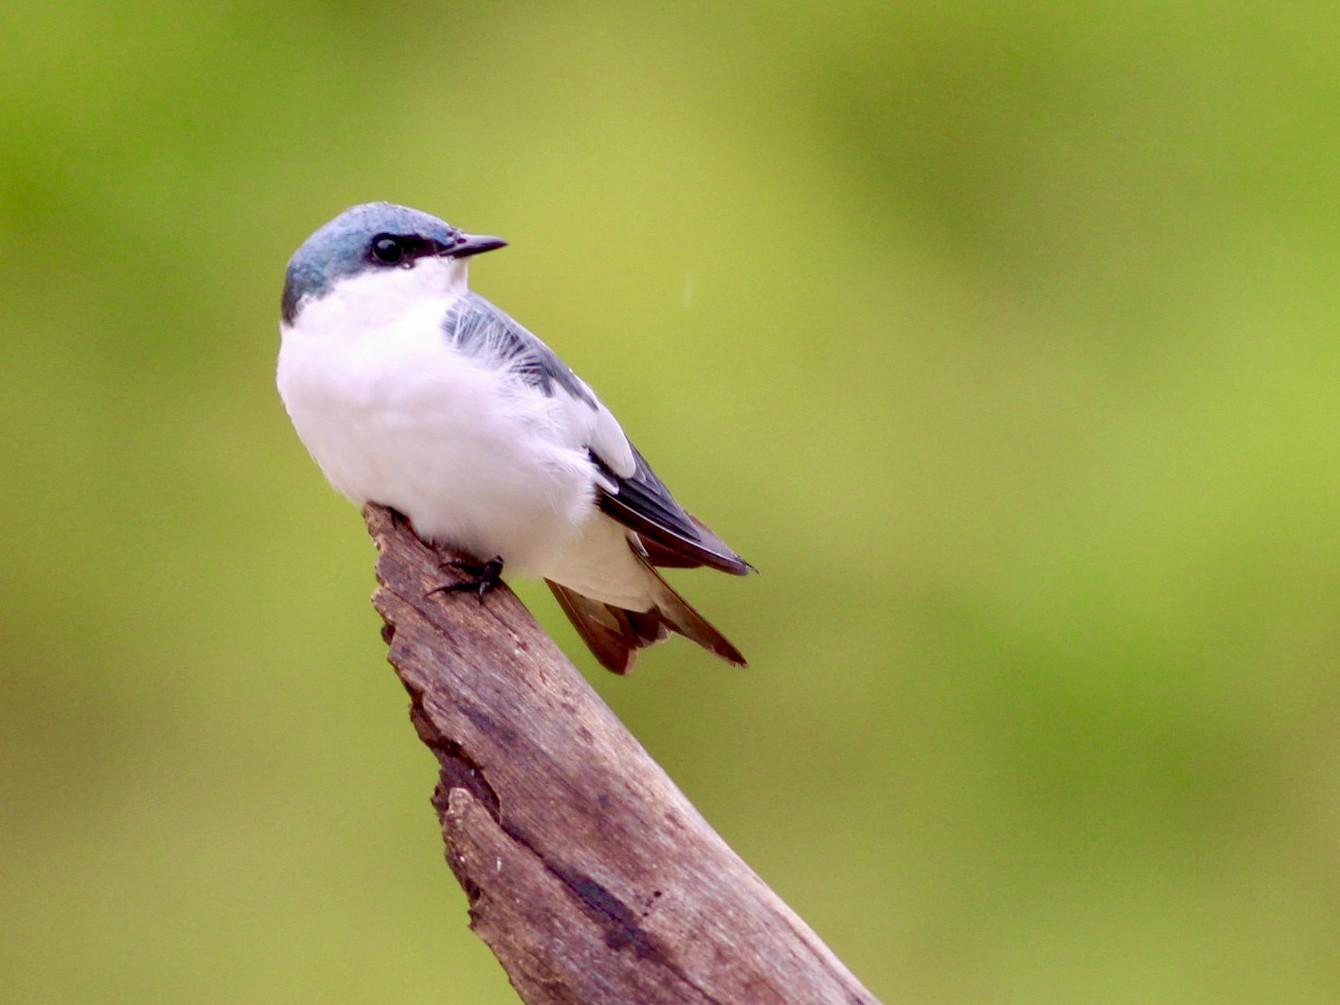 White-winged Swallow - Alex Wiebe